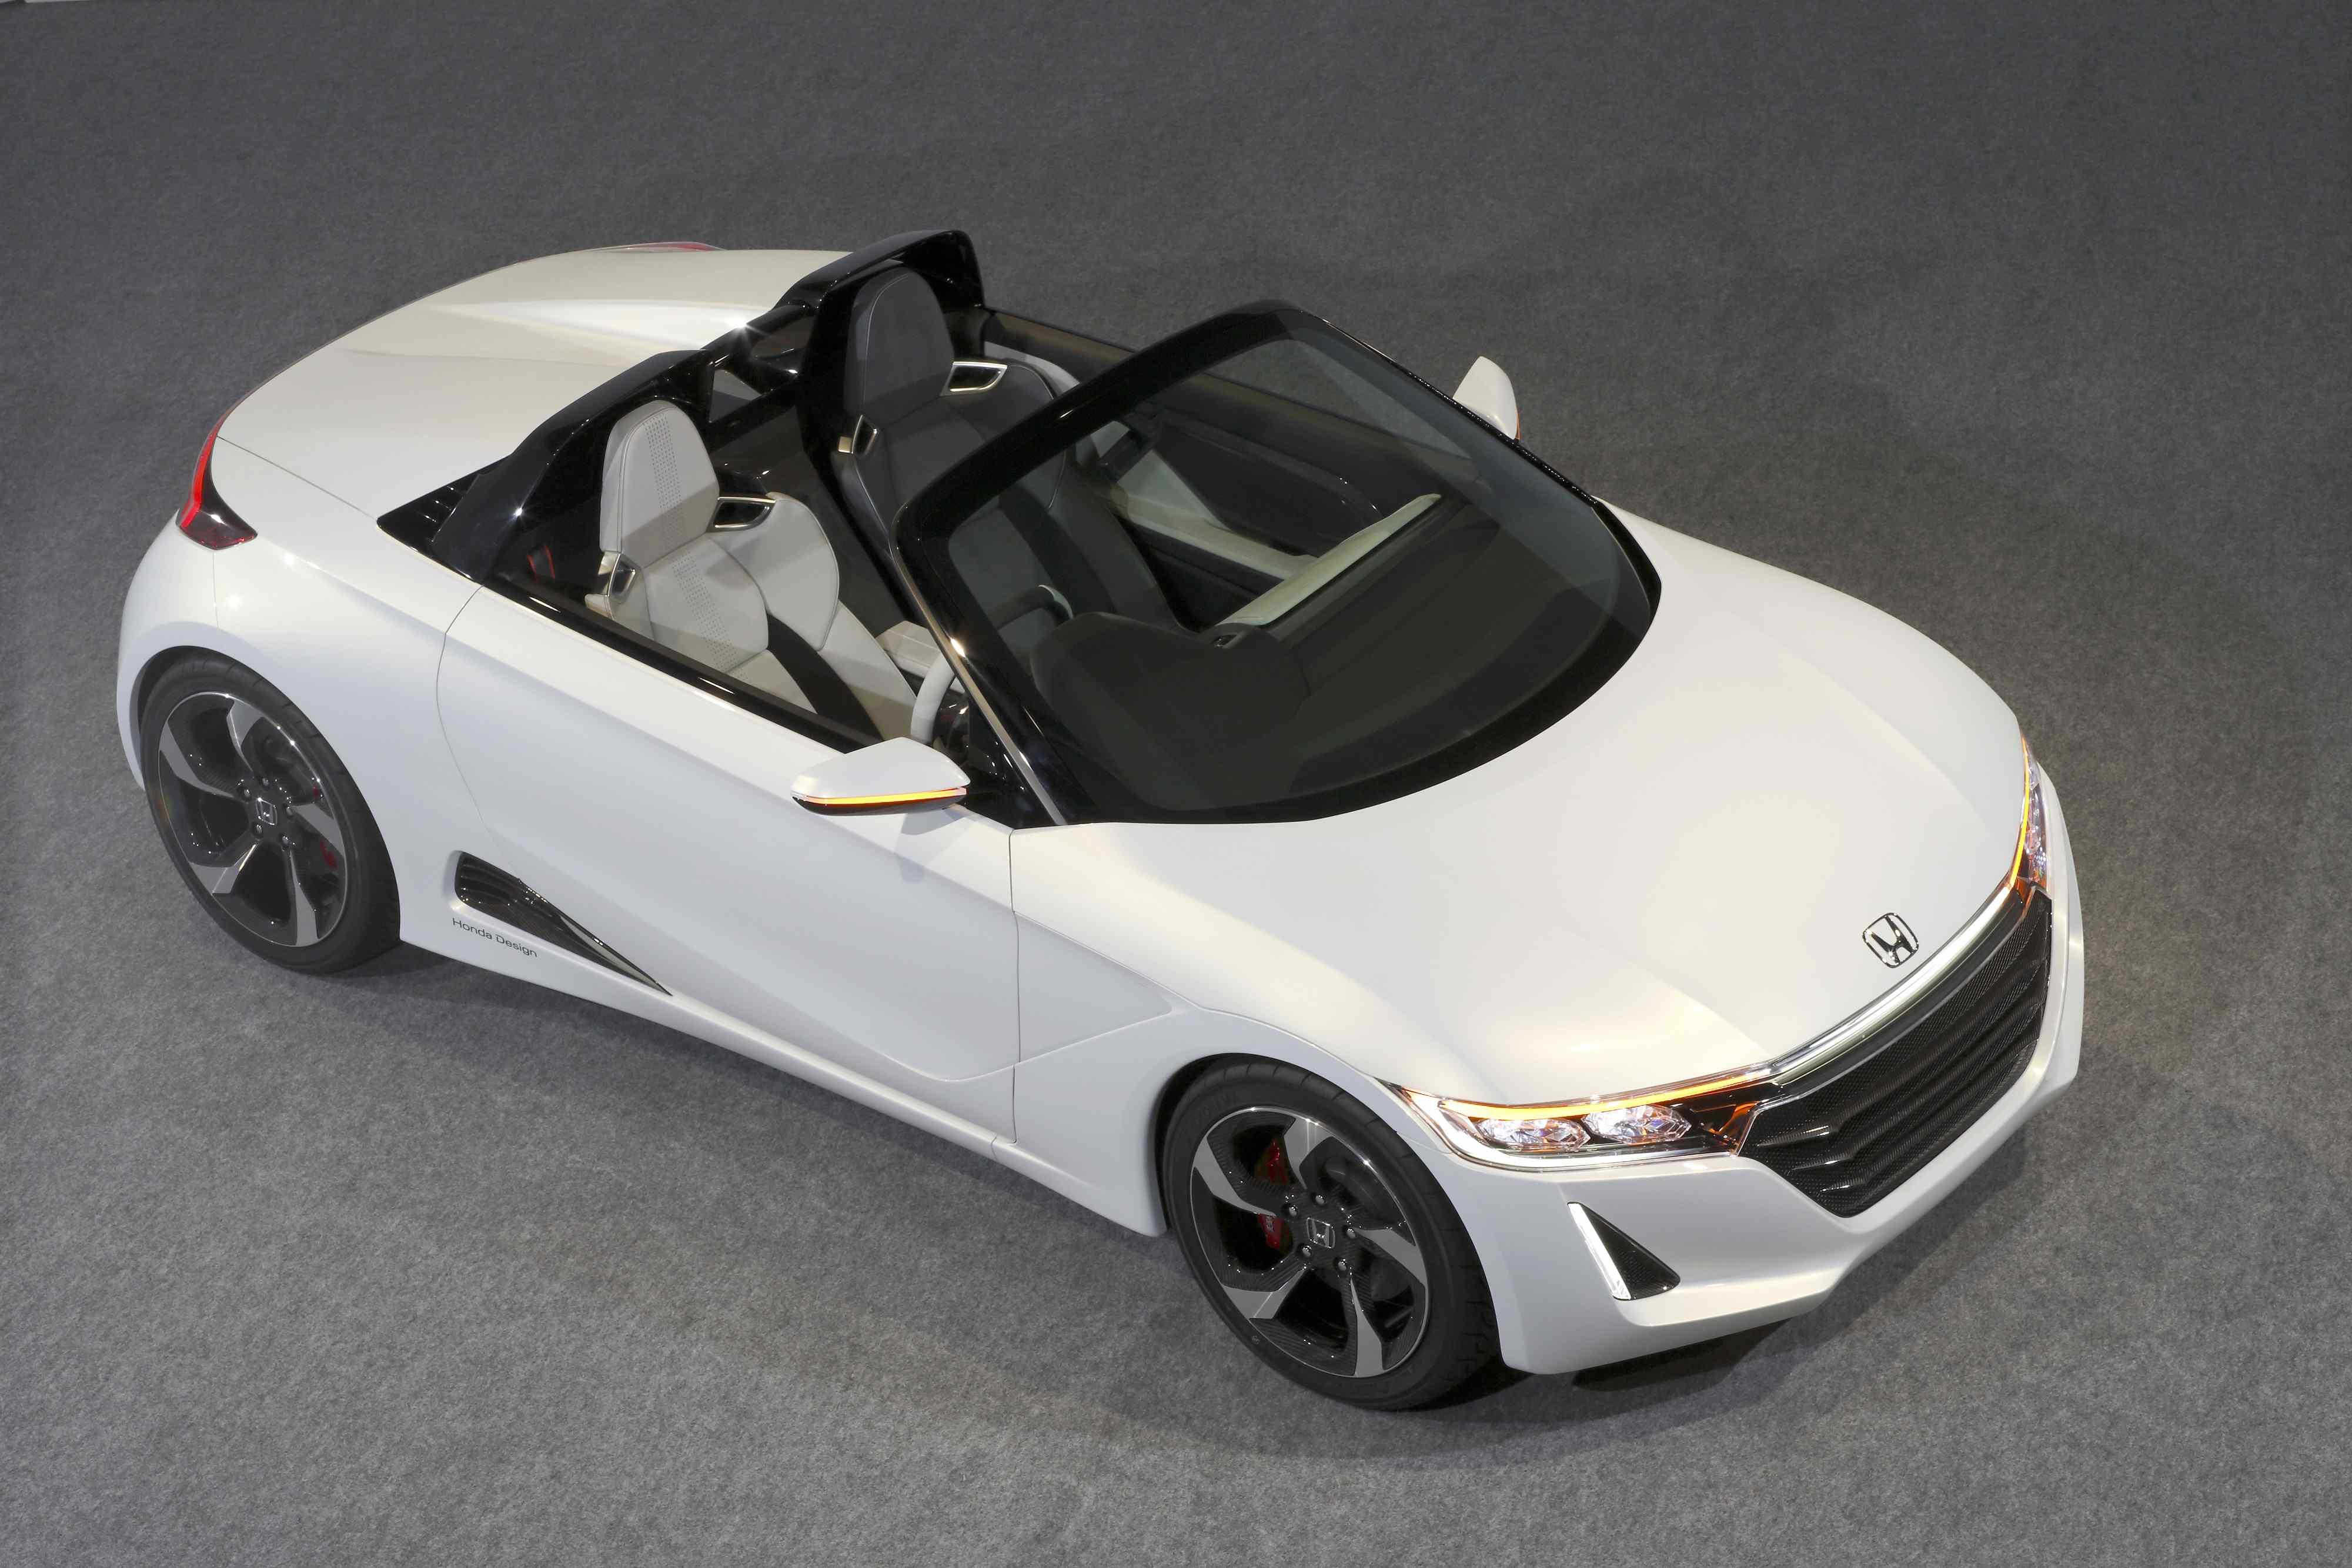 Hot Honda S660 Concept Latest News Surf4cars